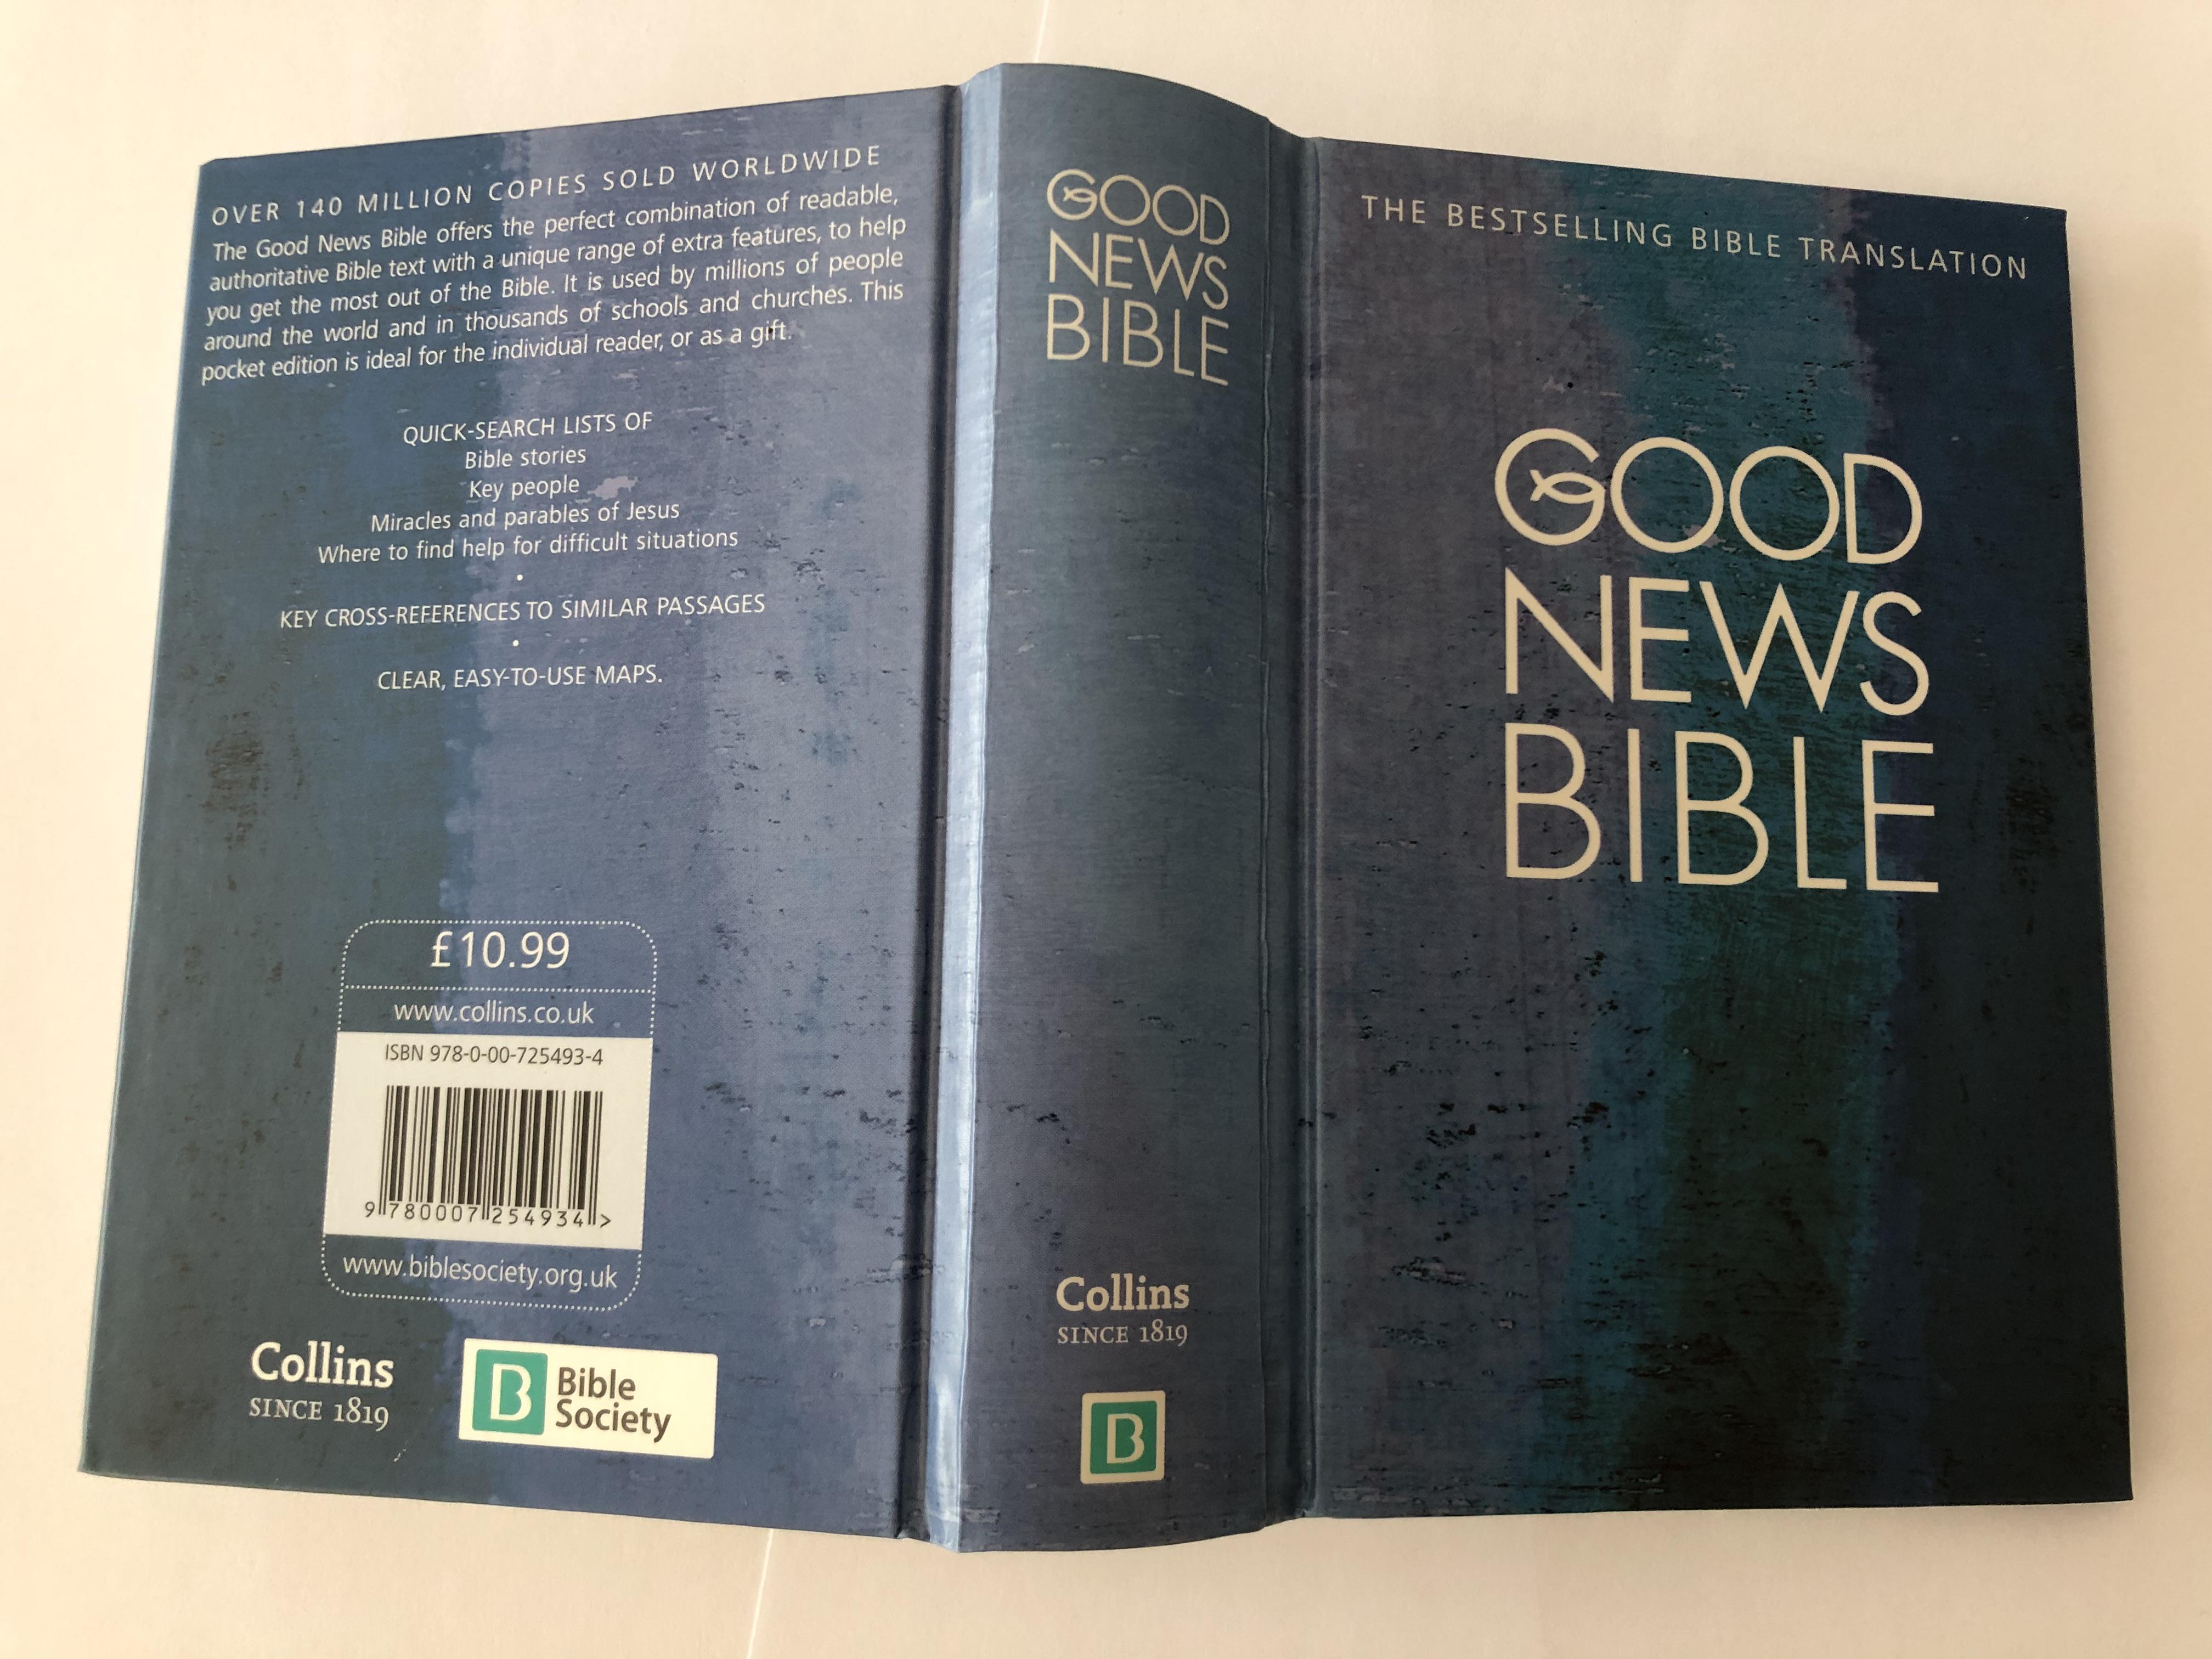 good-news-bible-2015-gnb-the-uk-s-bestselling-bible-translation-hardcover-pocket-edition-blue-3-.jpg